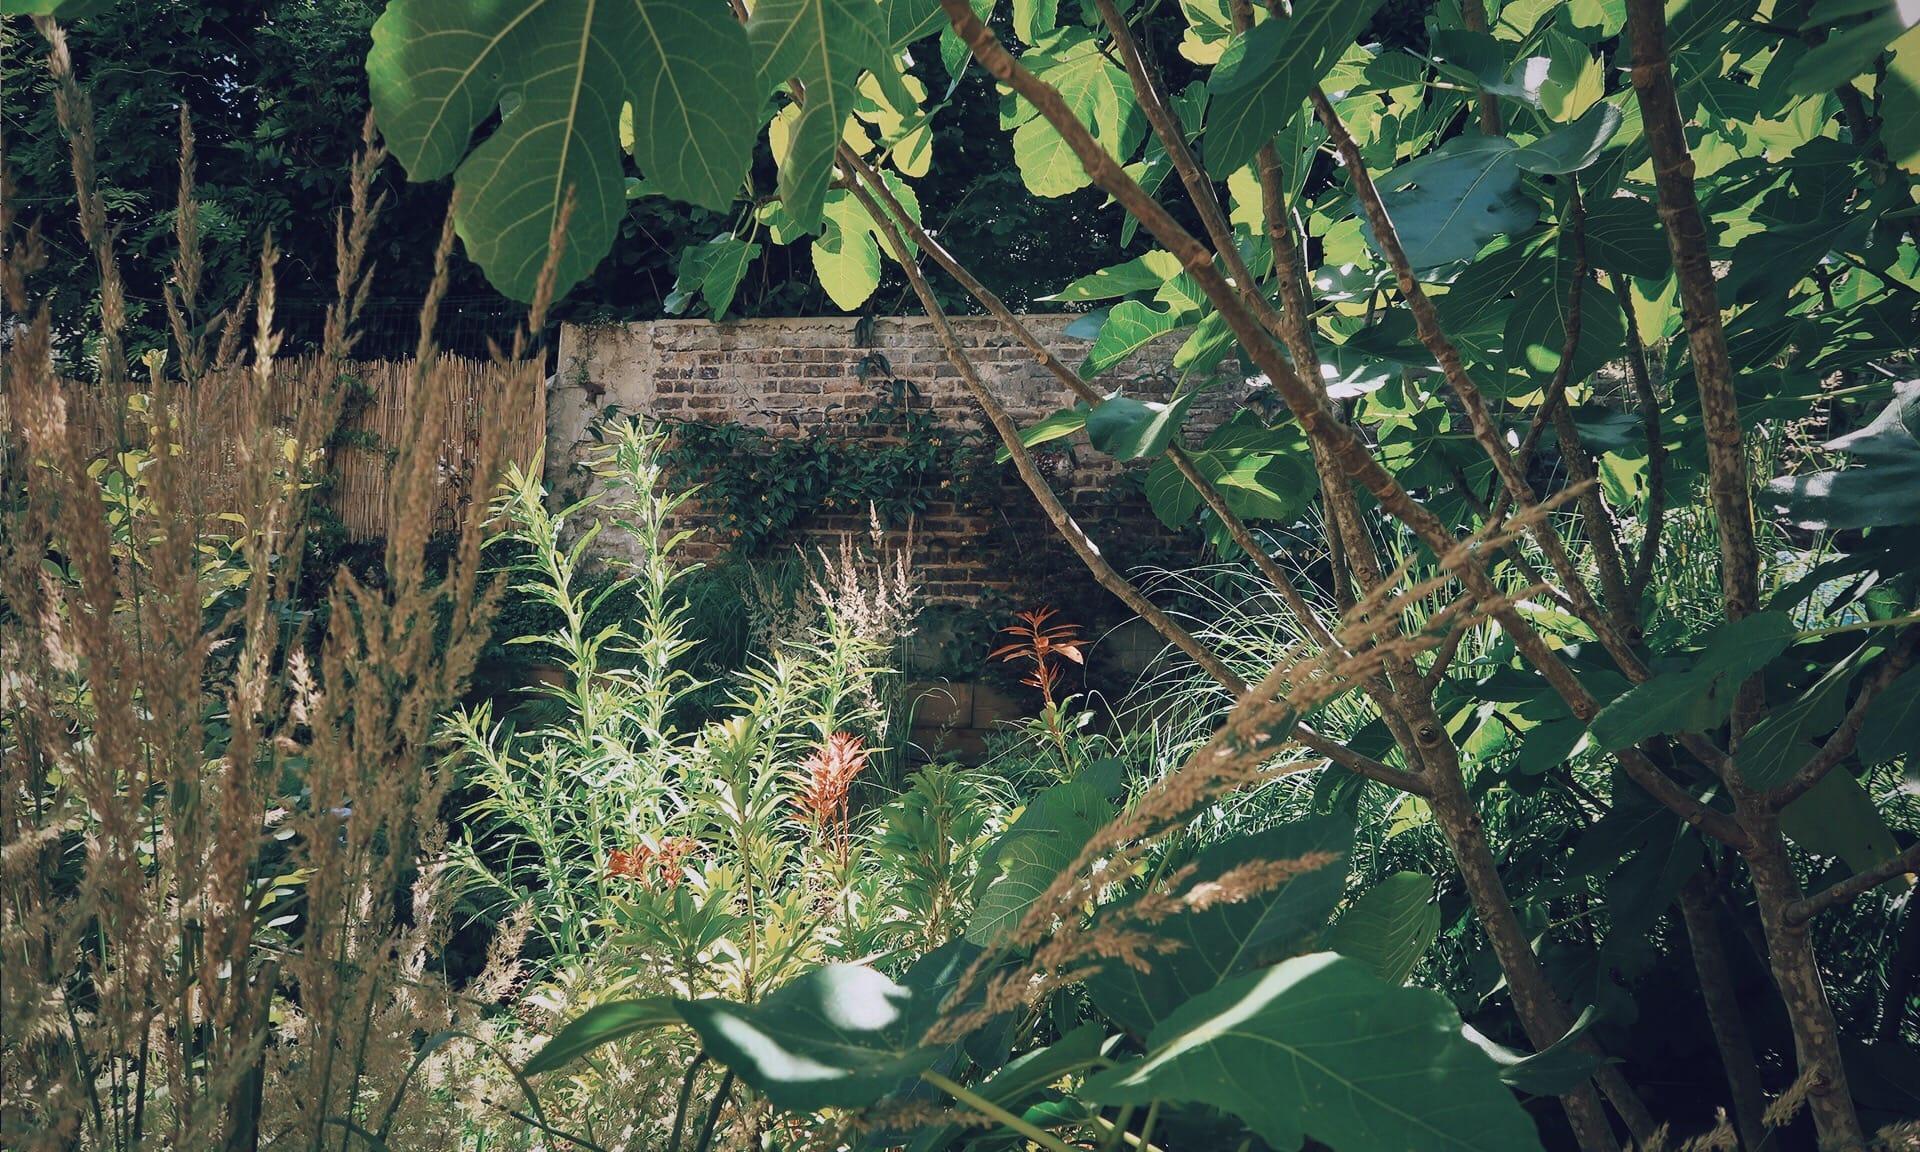 04_Nordscape_jardin-gradines-pente-vivaces-1